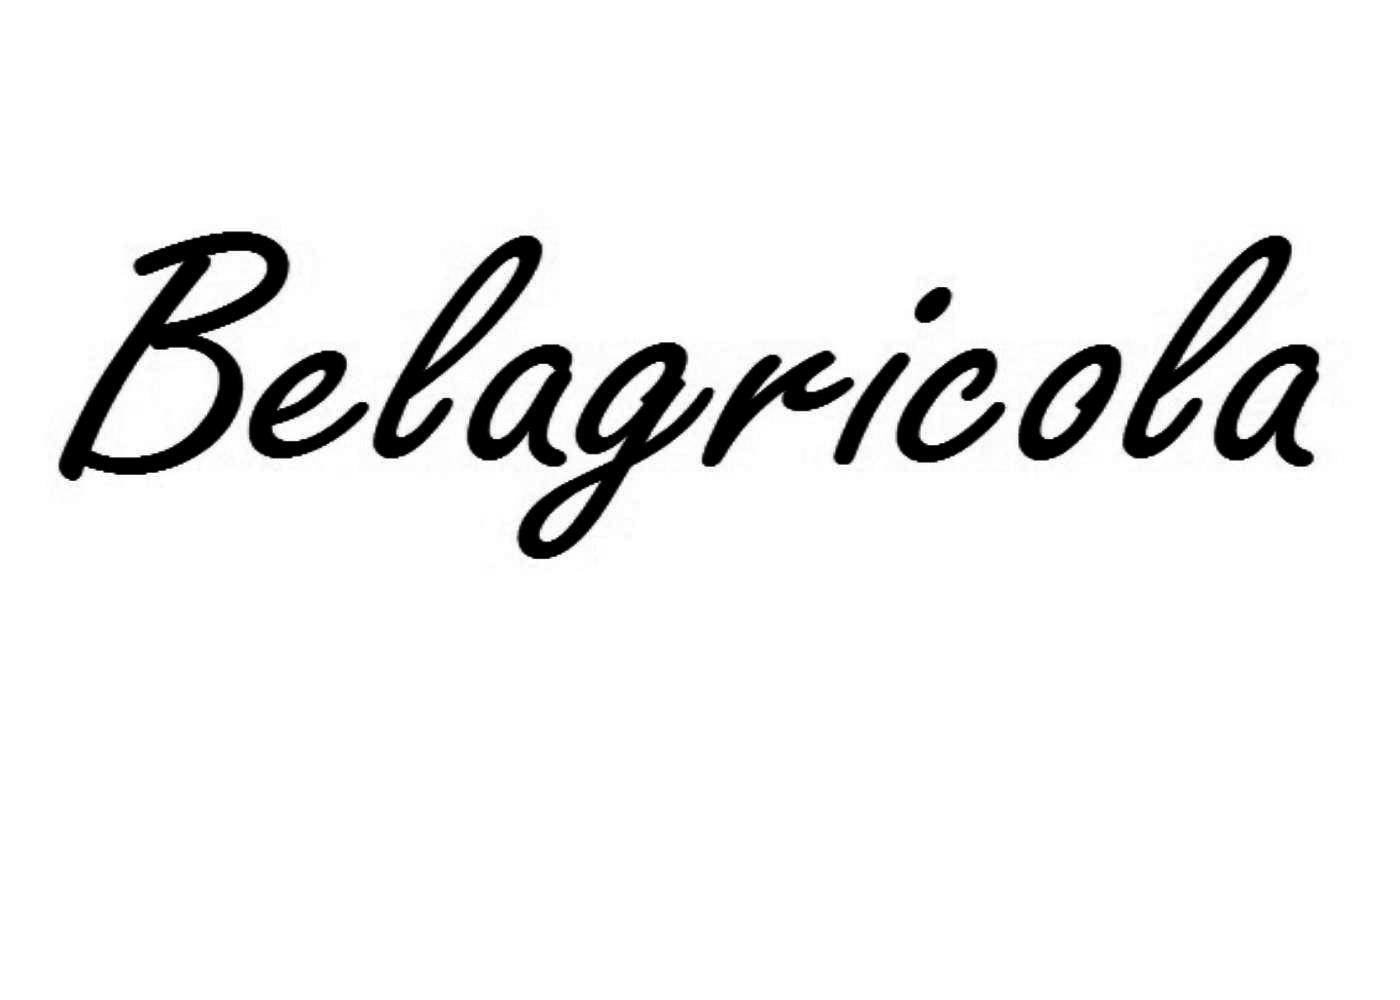 转让商标-BELAGRICOLA